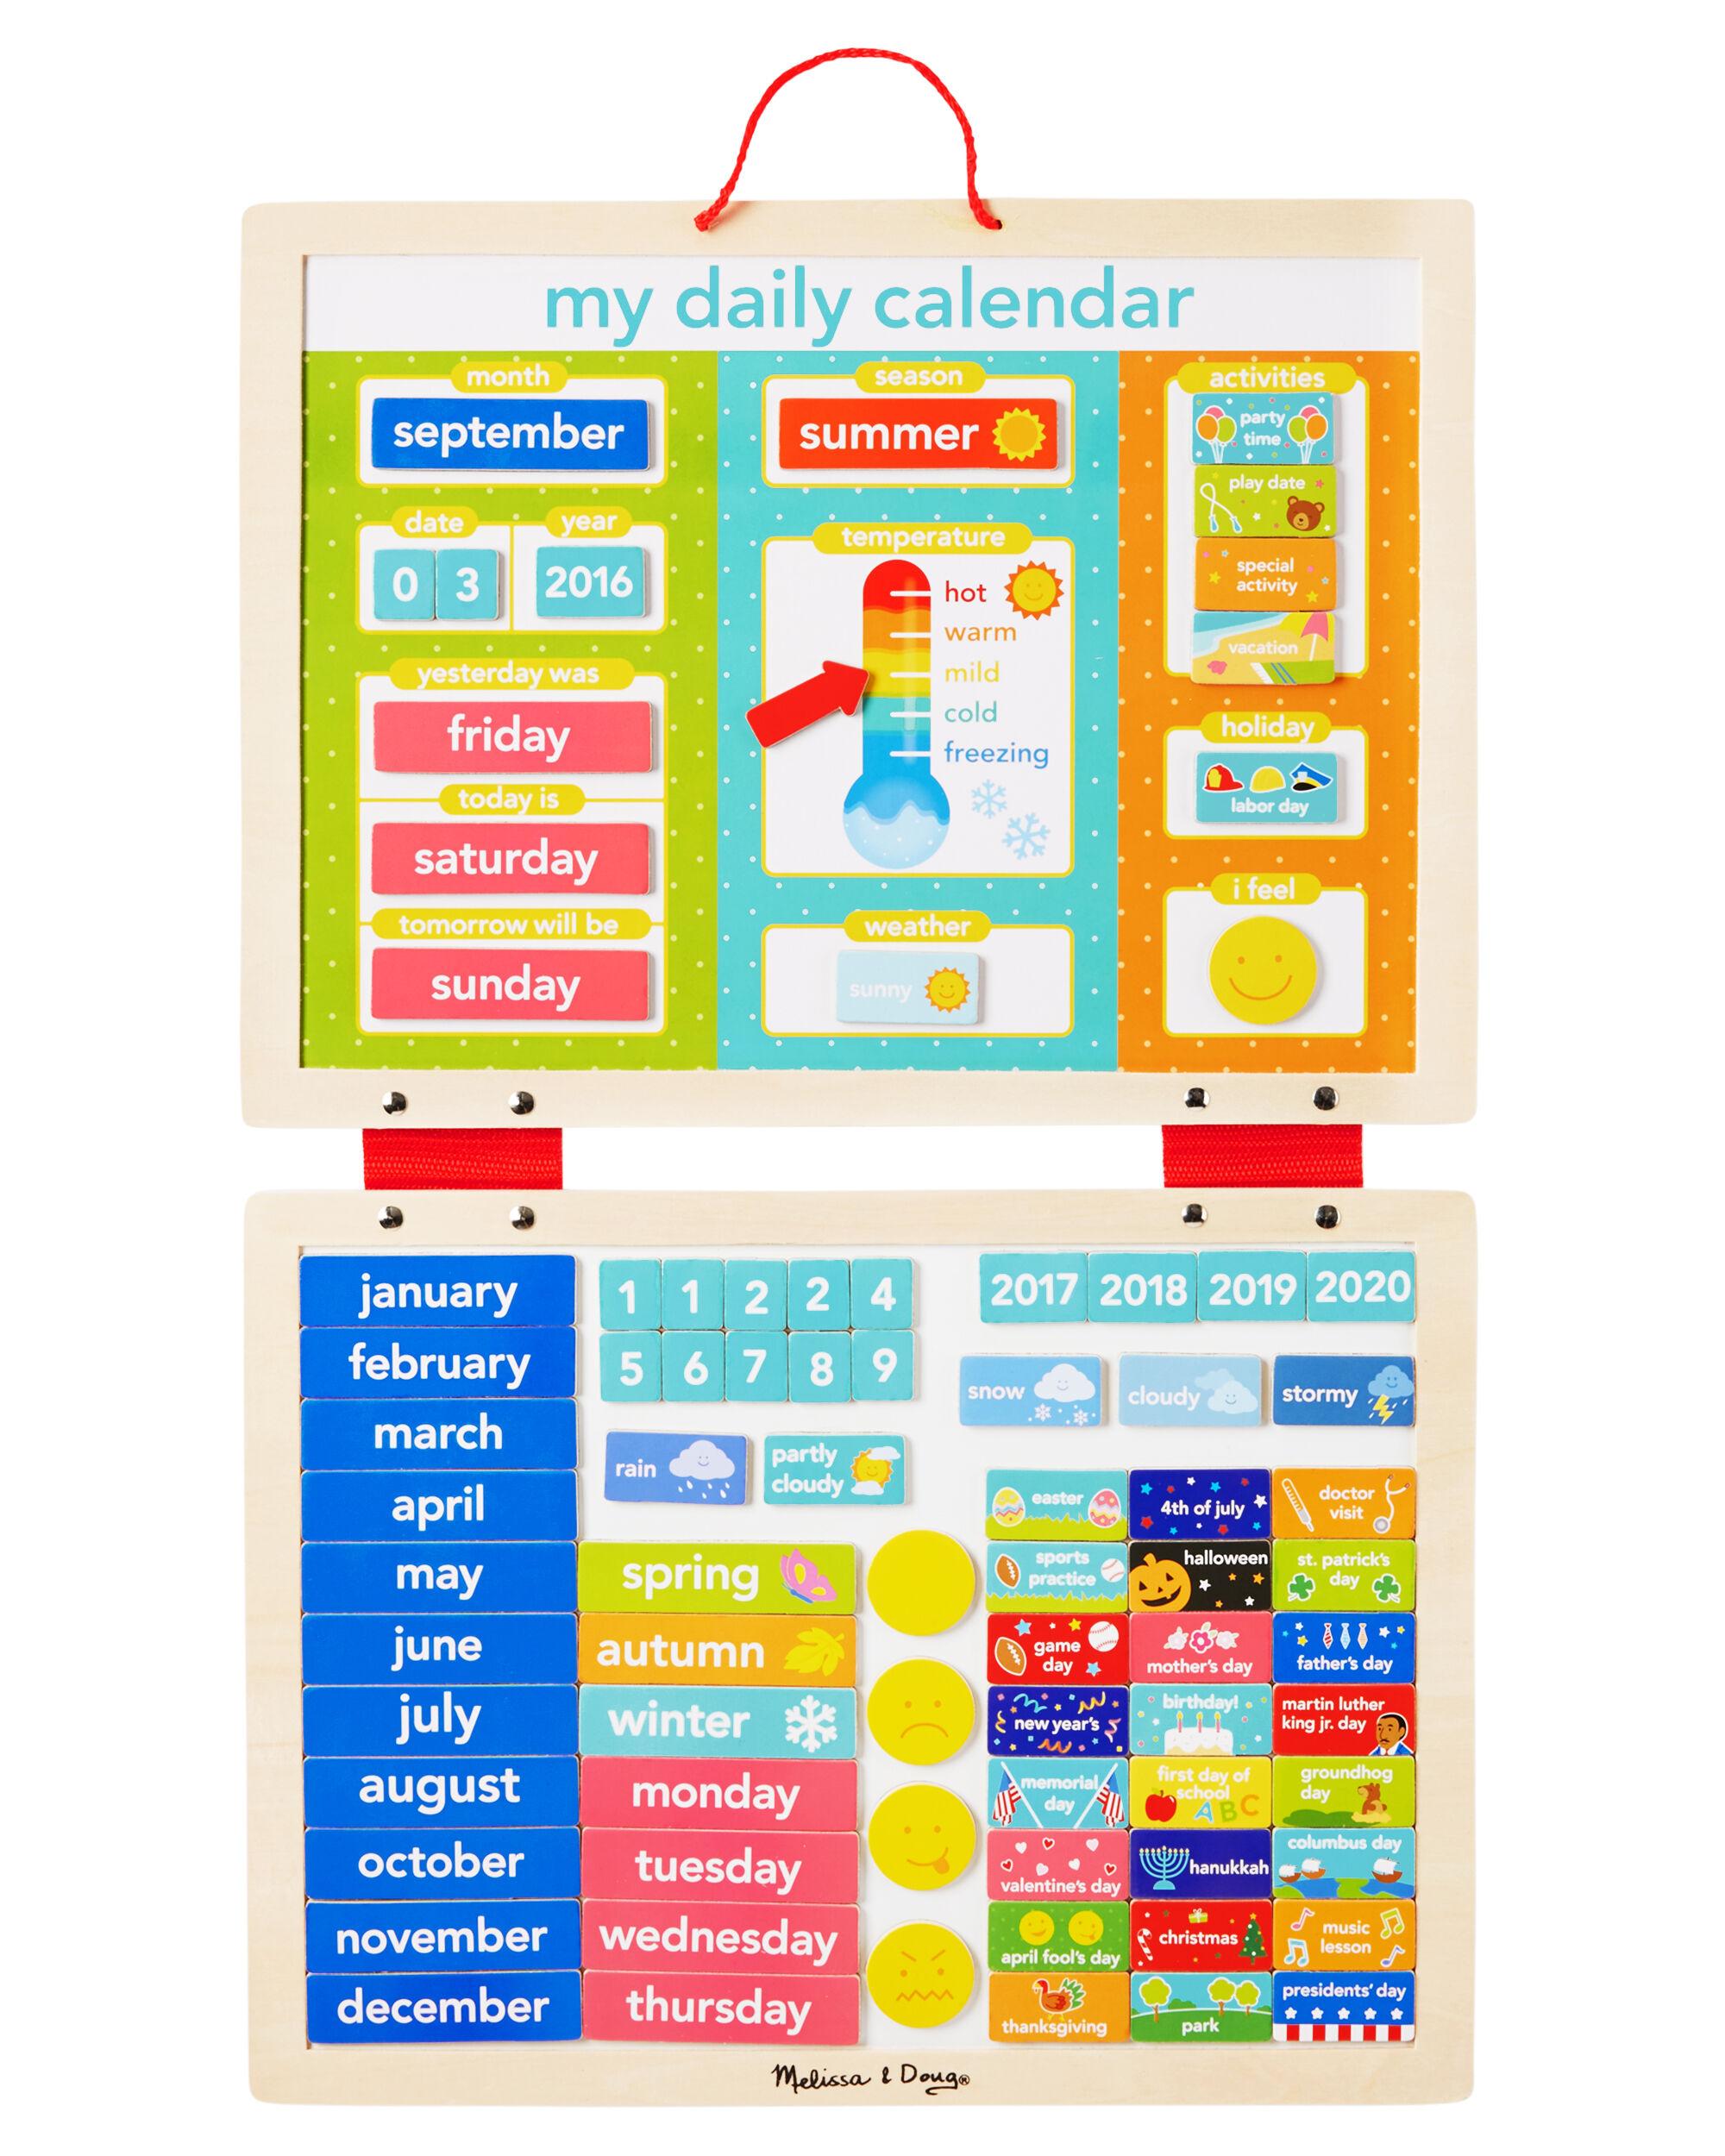 Hindu Calendar Design : Melissa and doug my magnetic daily calendar carters